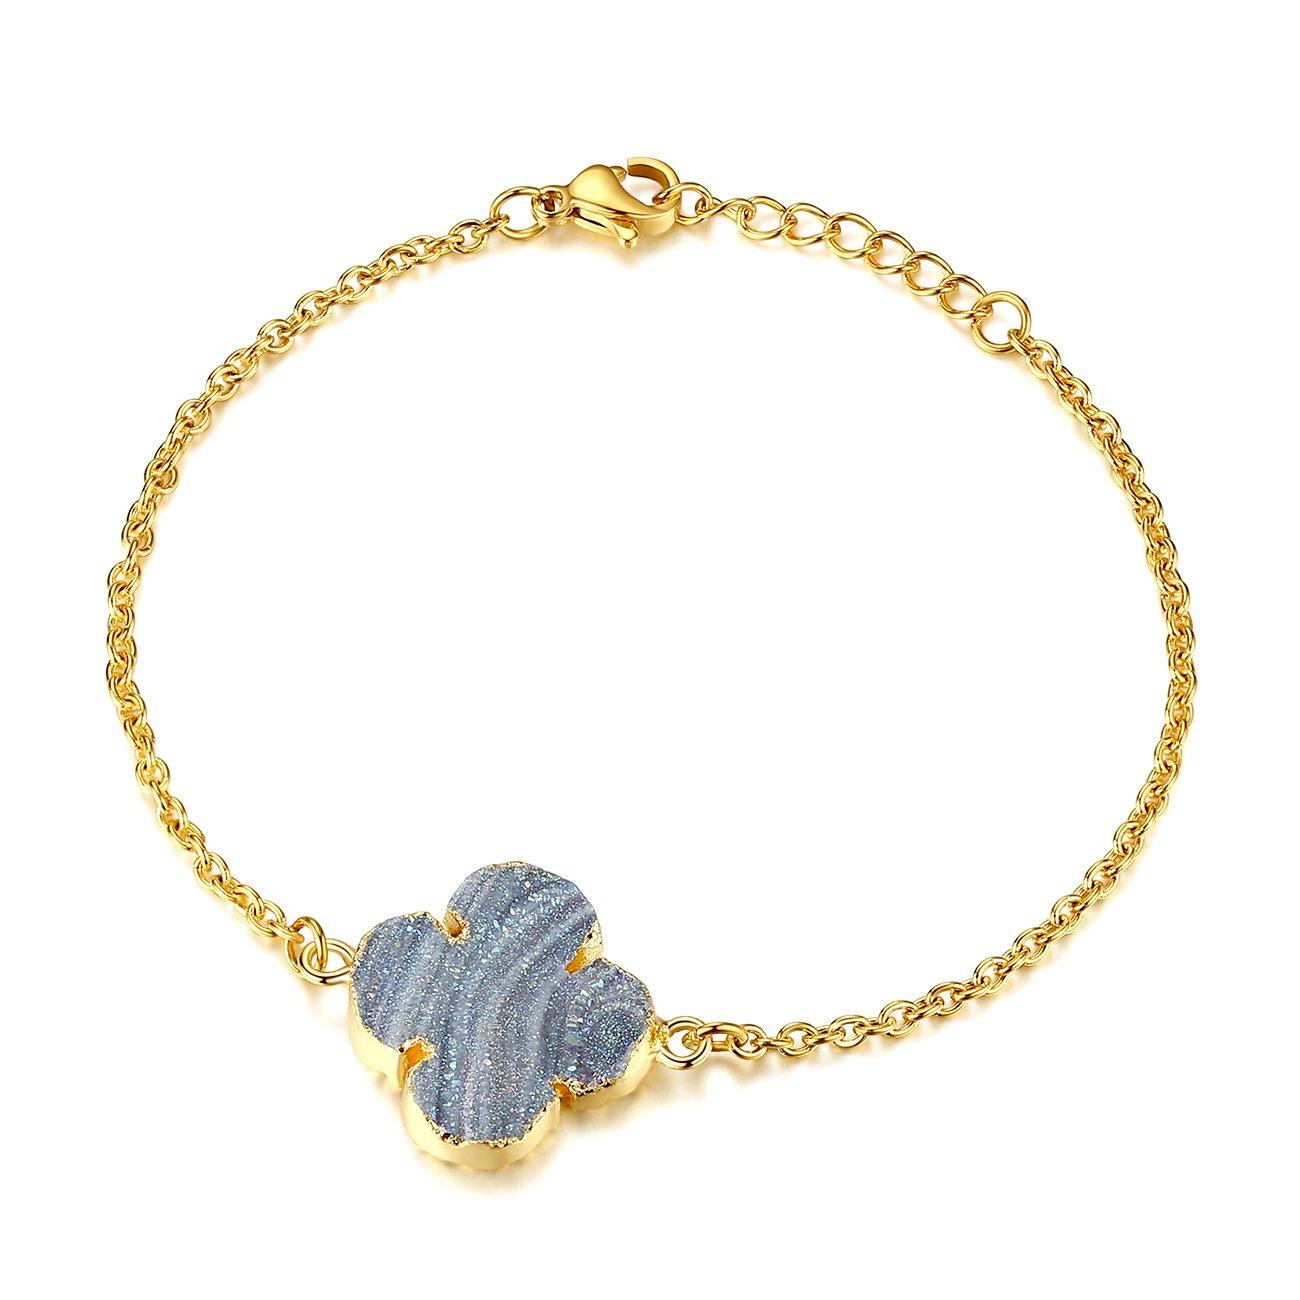 TOUGHARD Minimalist Handmade Natural Agate Druzy Charm Bracelet, Delicate Jewelry for Girls Women B07CCZKXQ1_US